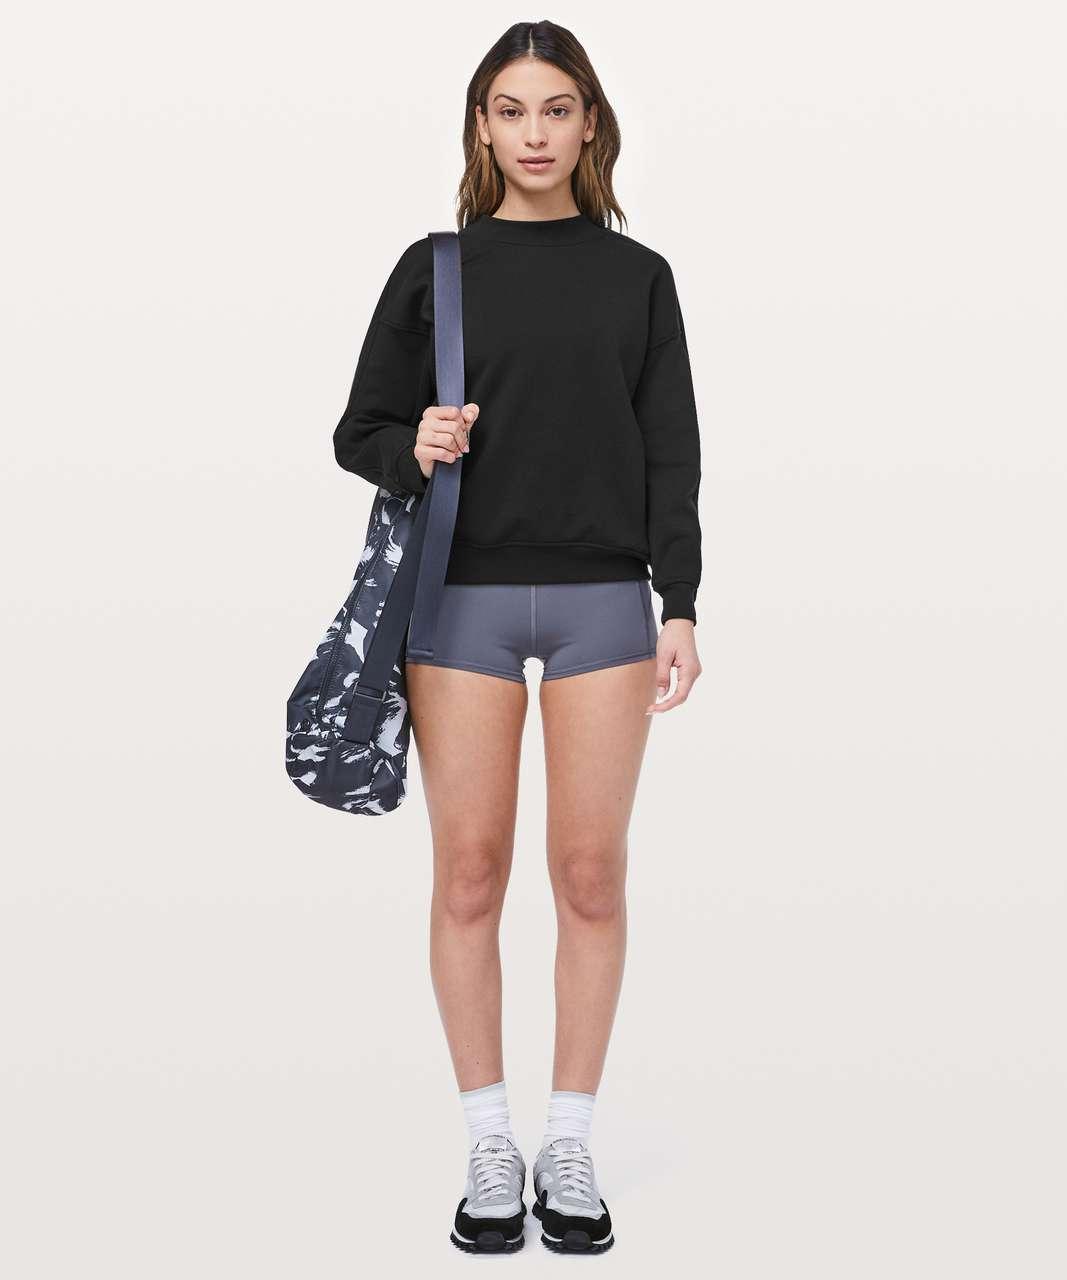 Lululemon Chill On Pullover - Black